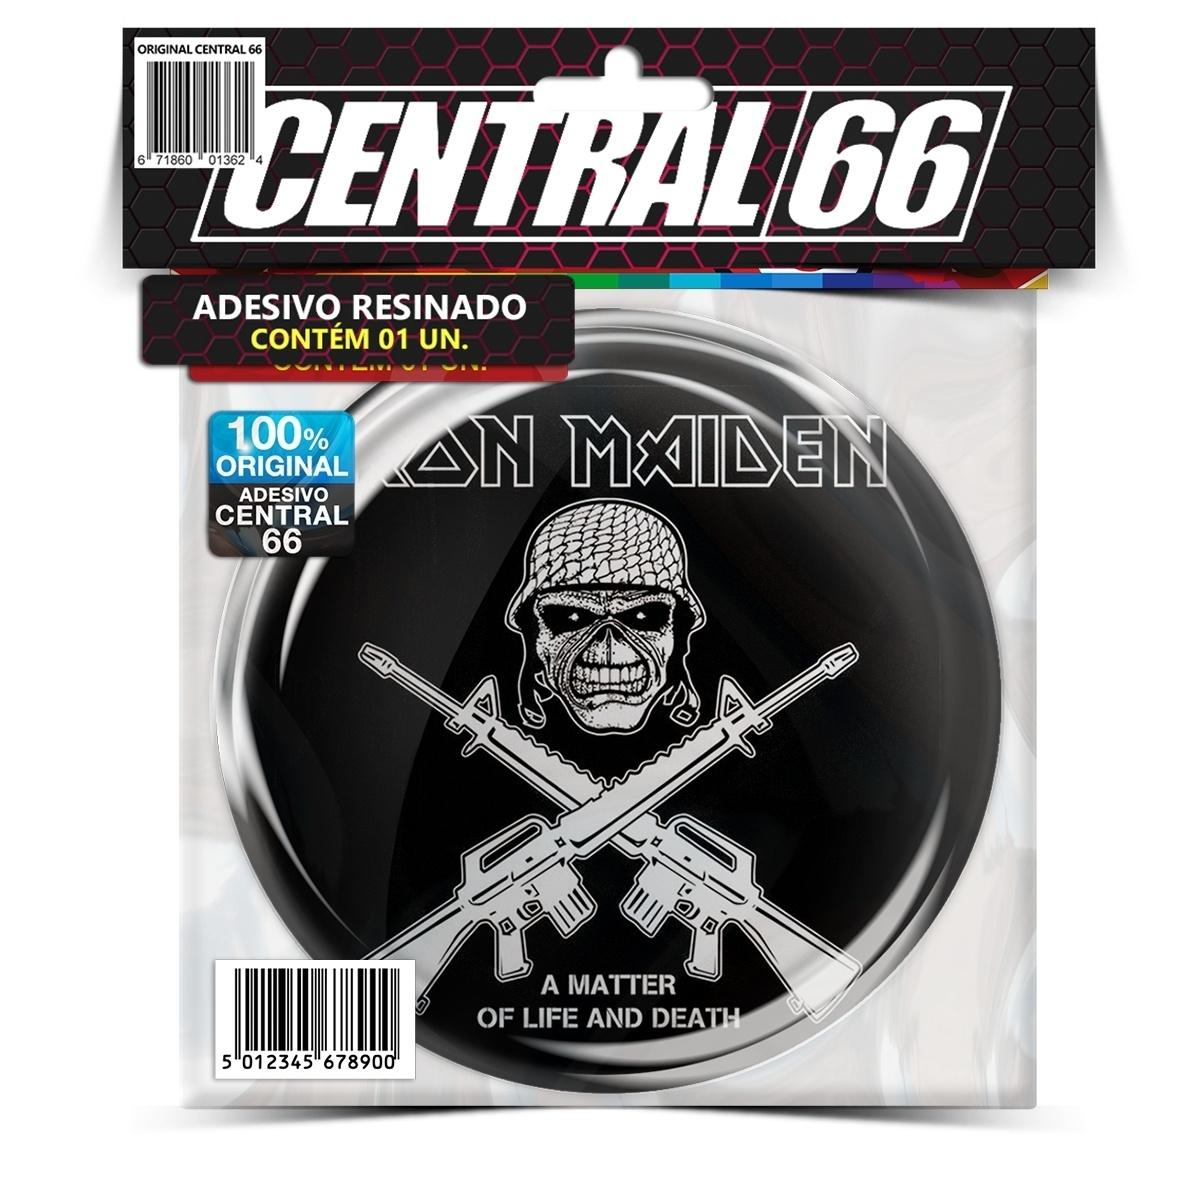 Adesivo Redondo Motorhead Lemmy Saves – Central 66